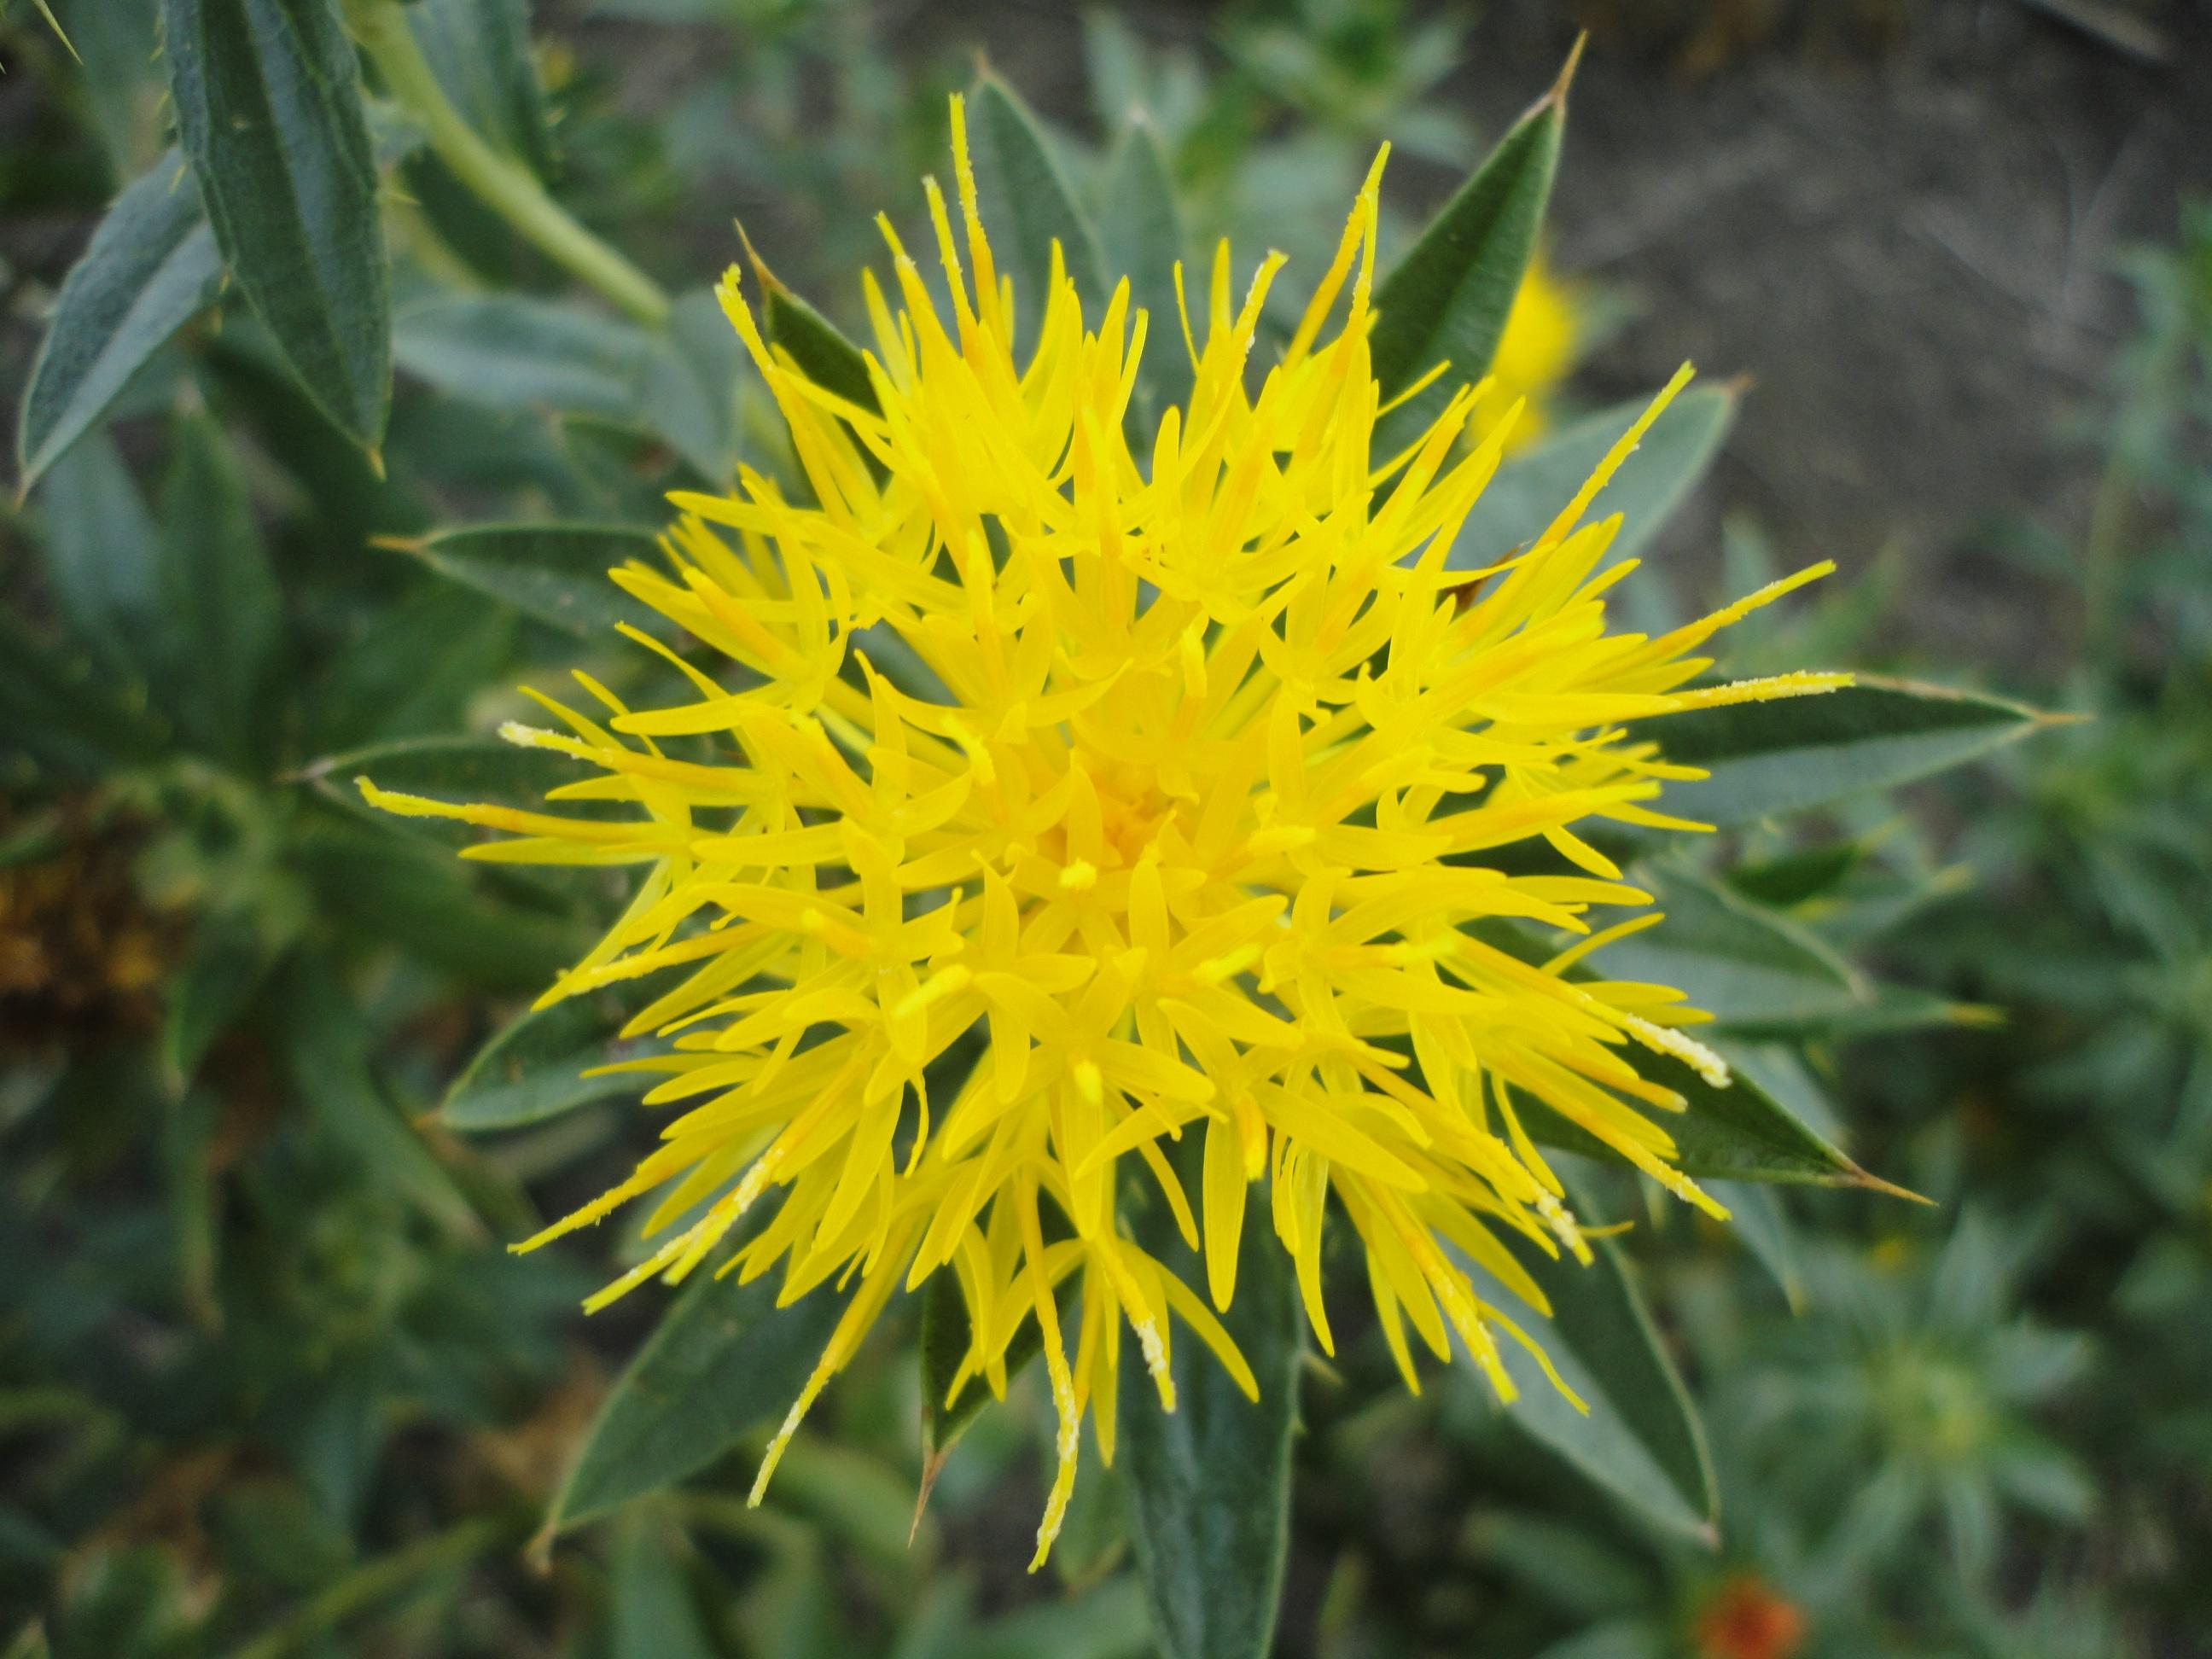 Free Images Nature Dandelion Petal Botany Flora Yellow Flower